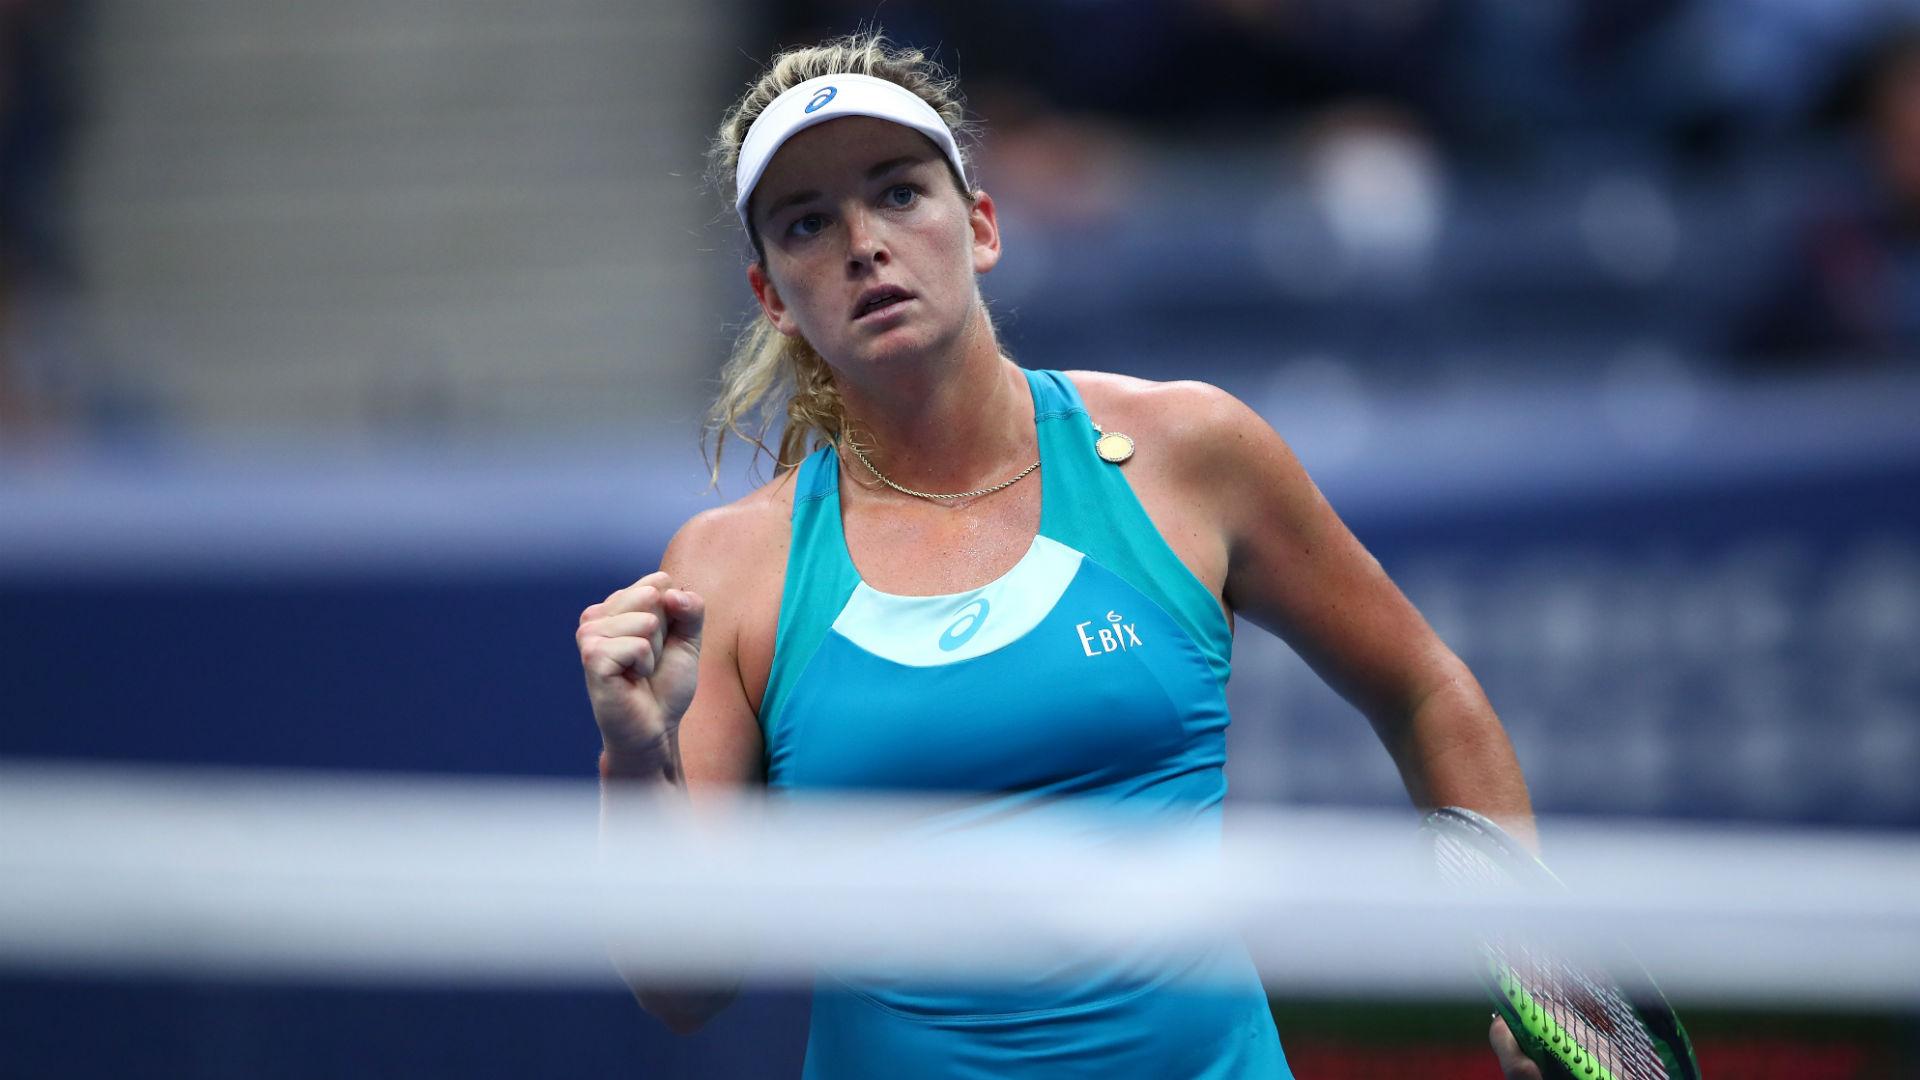 U.S. Open 2017: CoCo Vandeweghe upsets No. 1 seed Karolina Pliskova to reach semis